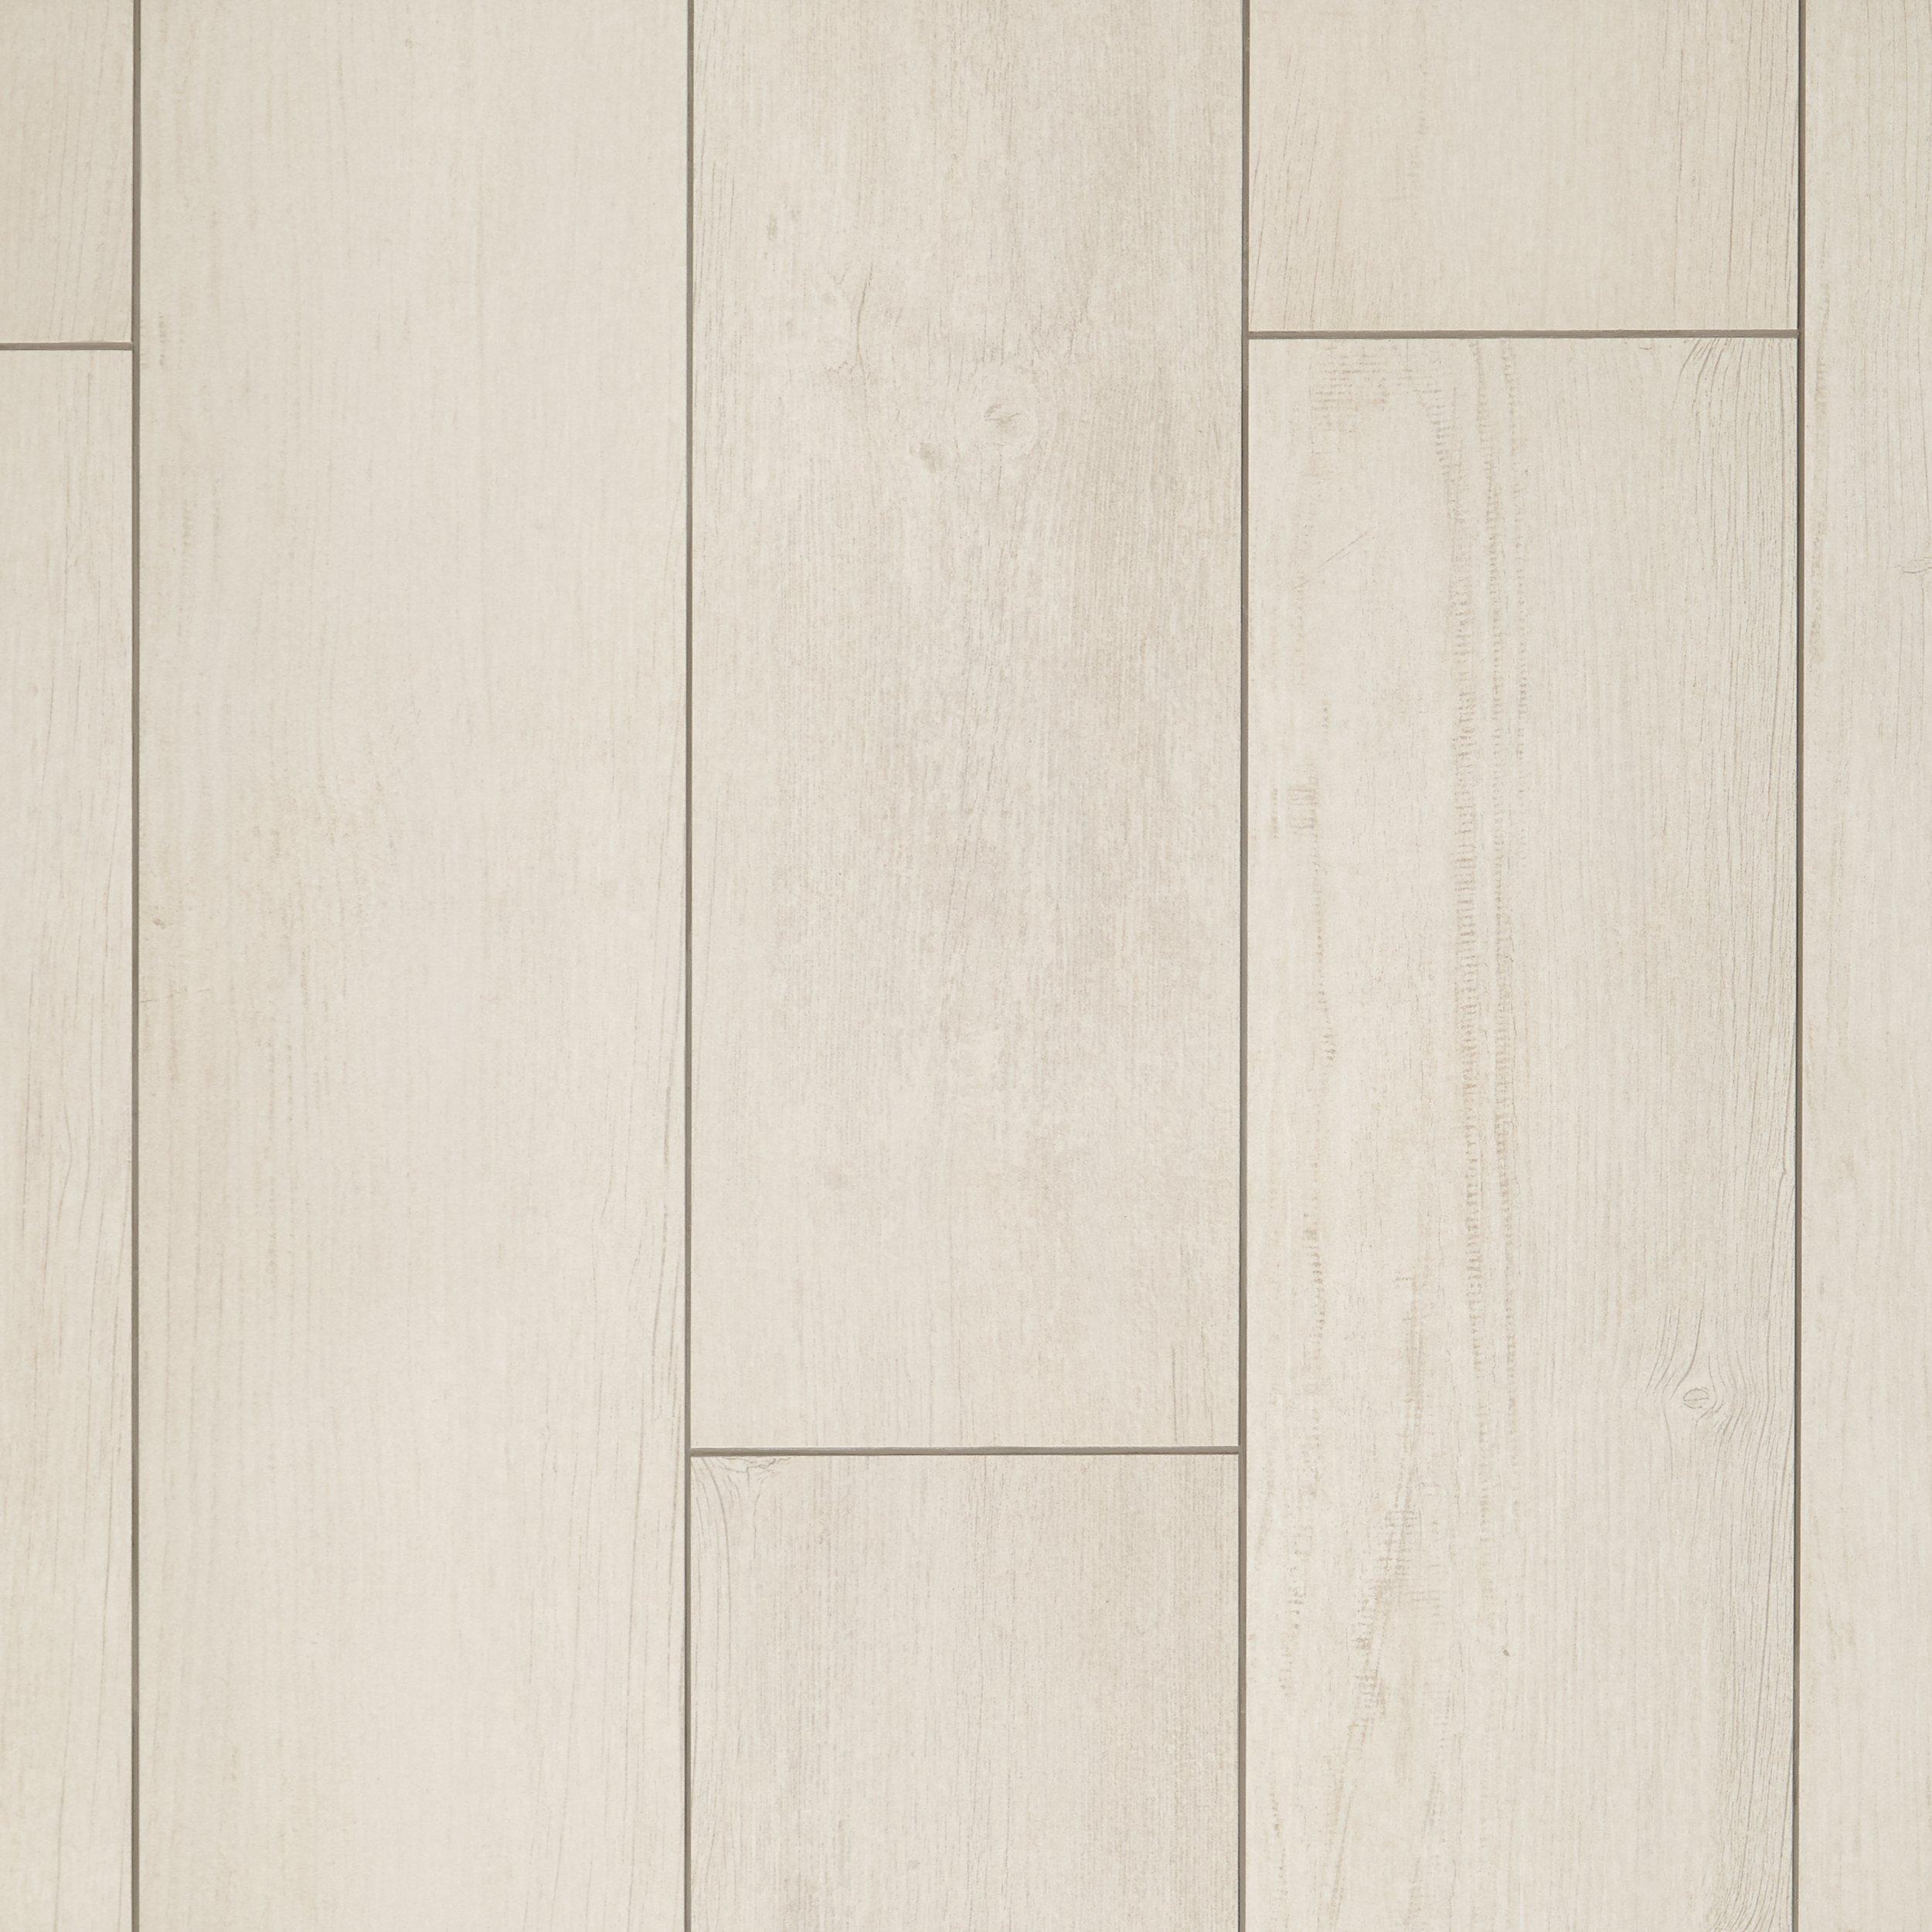 Merveilleux Amber White Wood Plank Porcelain Tile   10 X 60   100503309 | Floor And  Decor